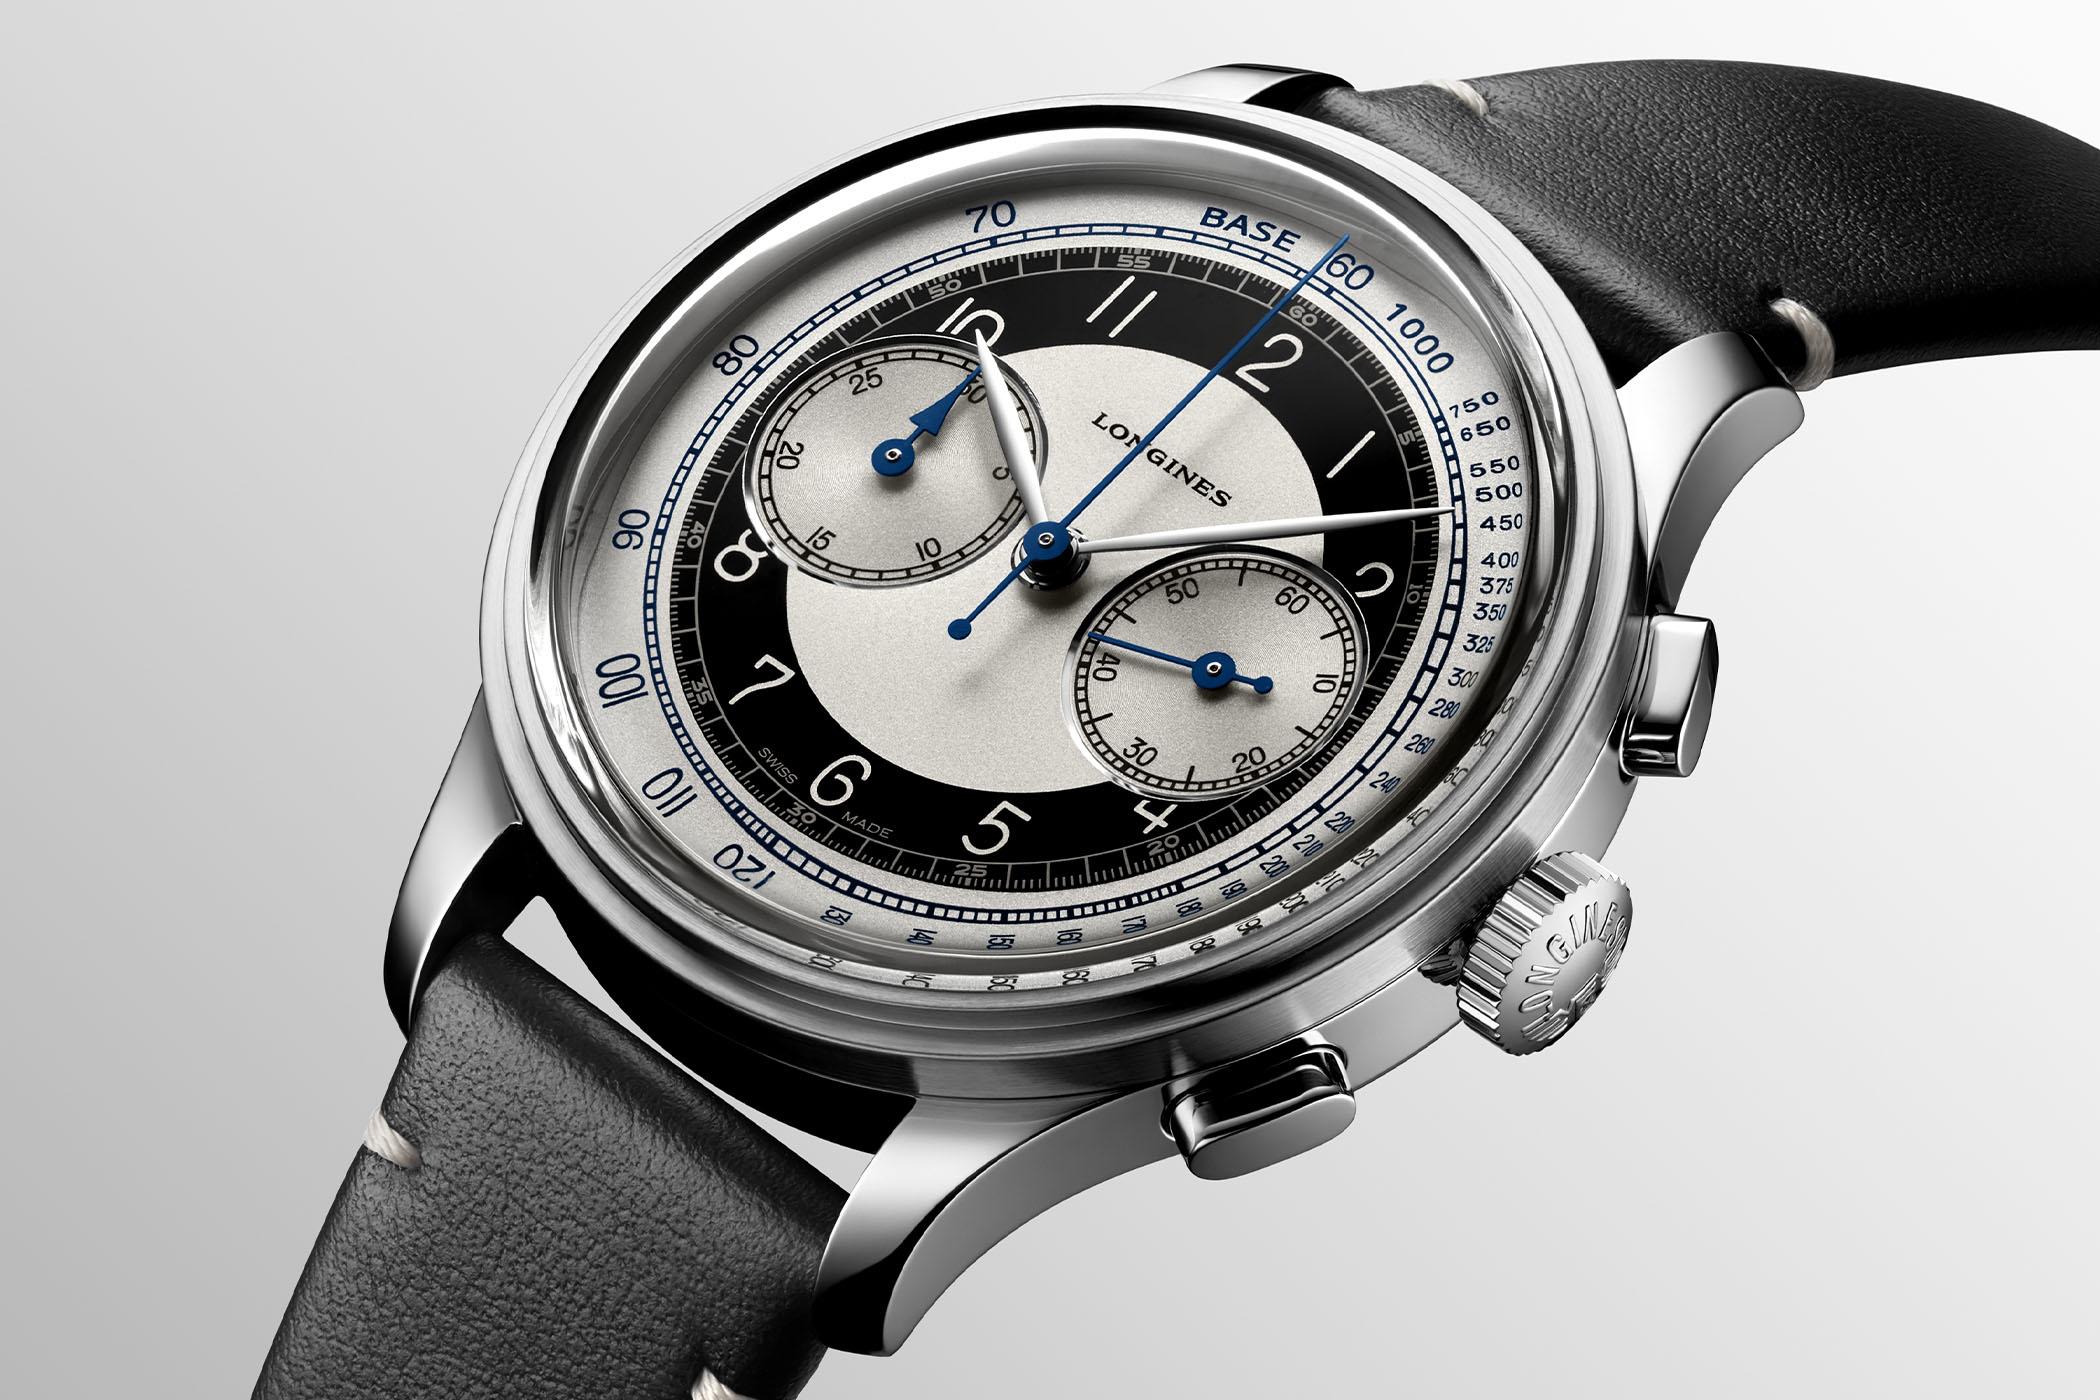 2020 Longines Heritage Tuxedo Chronograph L2.830.4.93.0 1